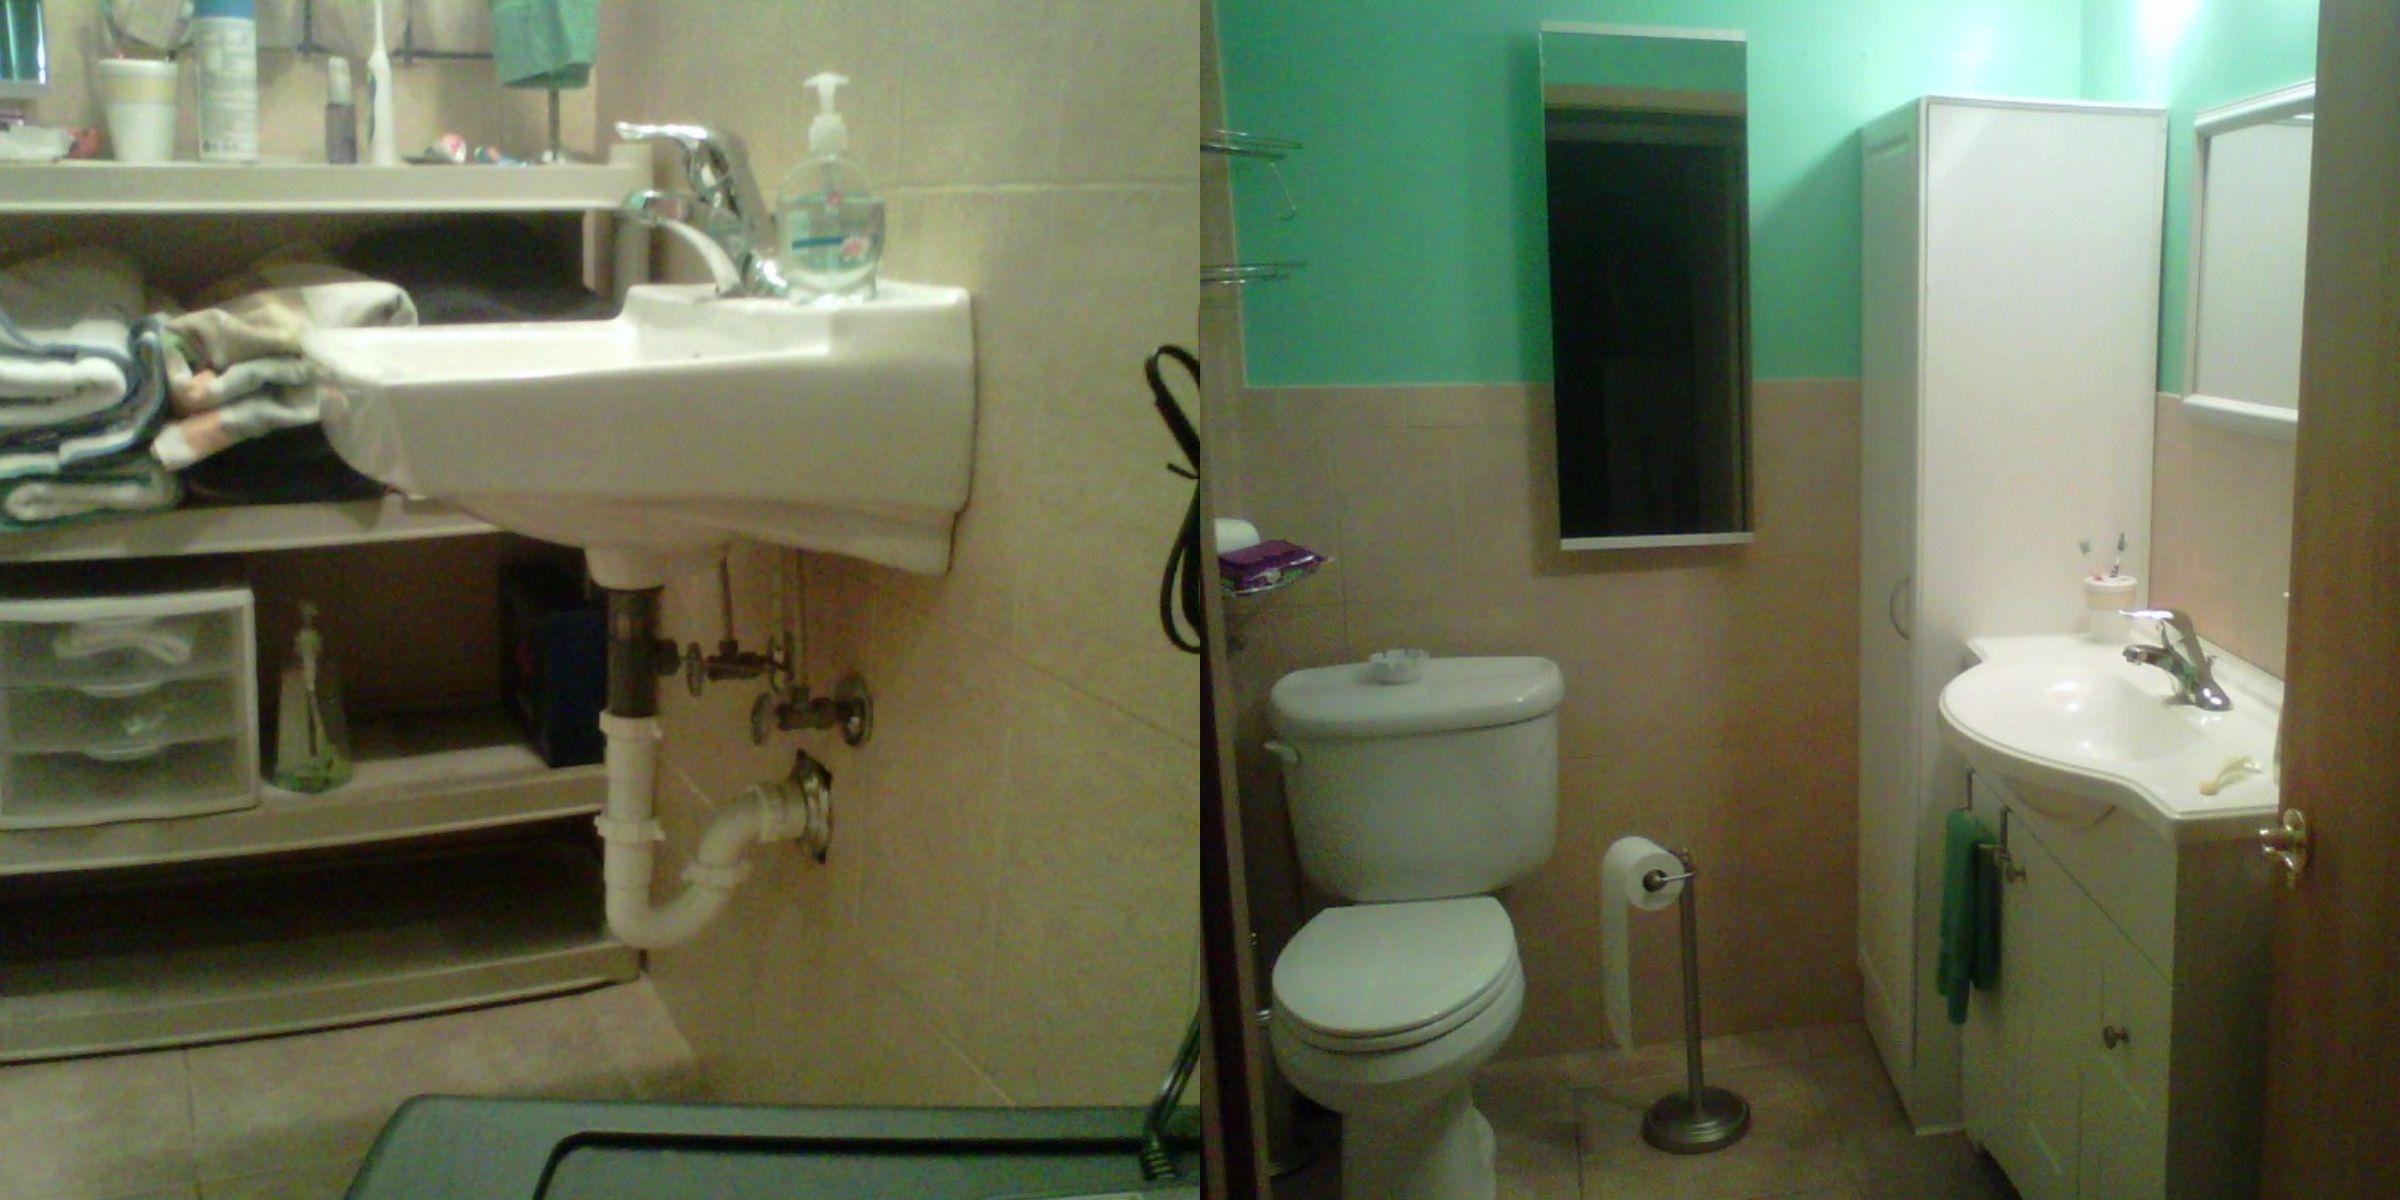 Diy Bathroom Remodel Pinterest : Like image